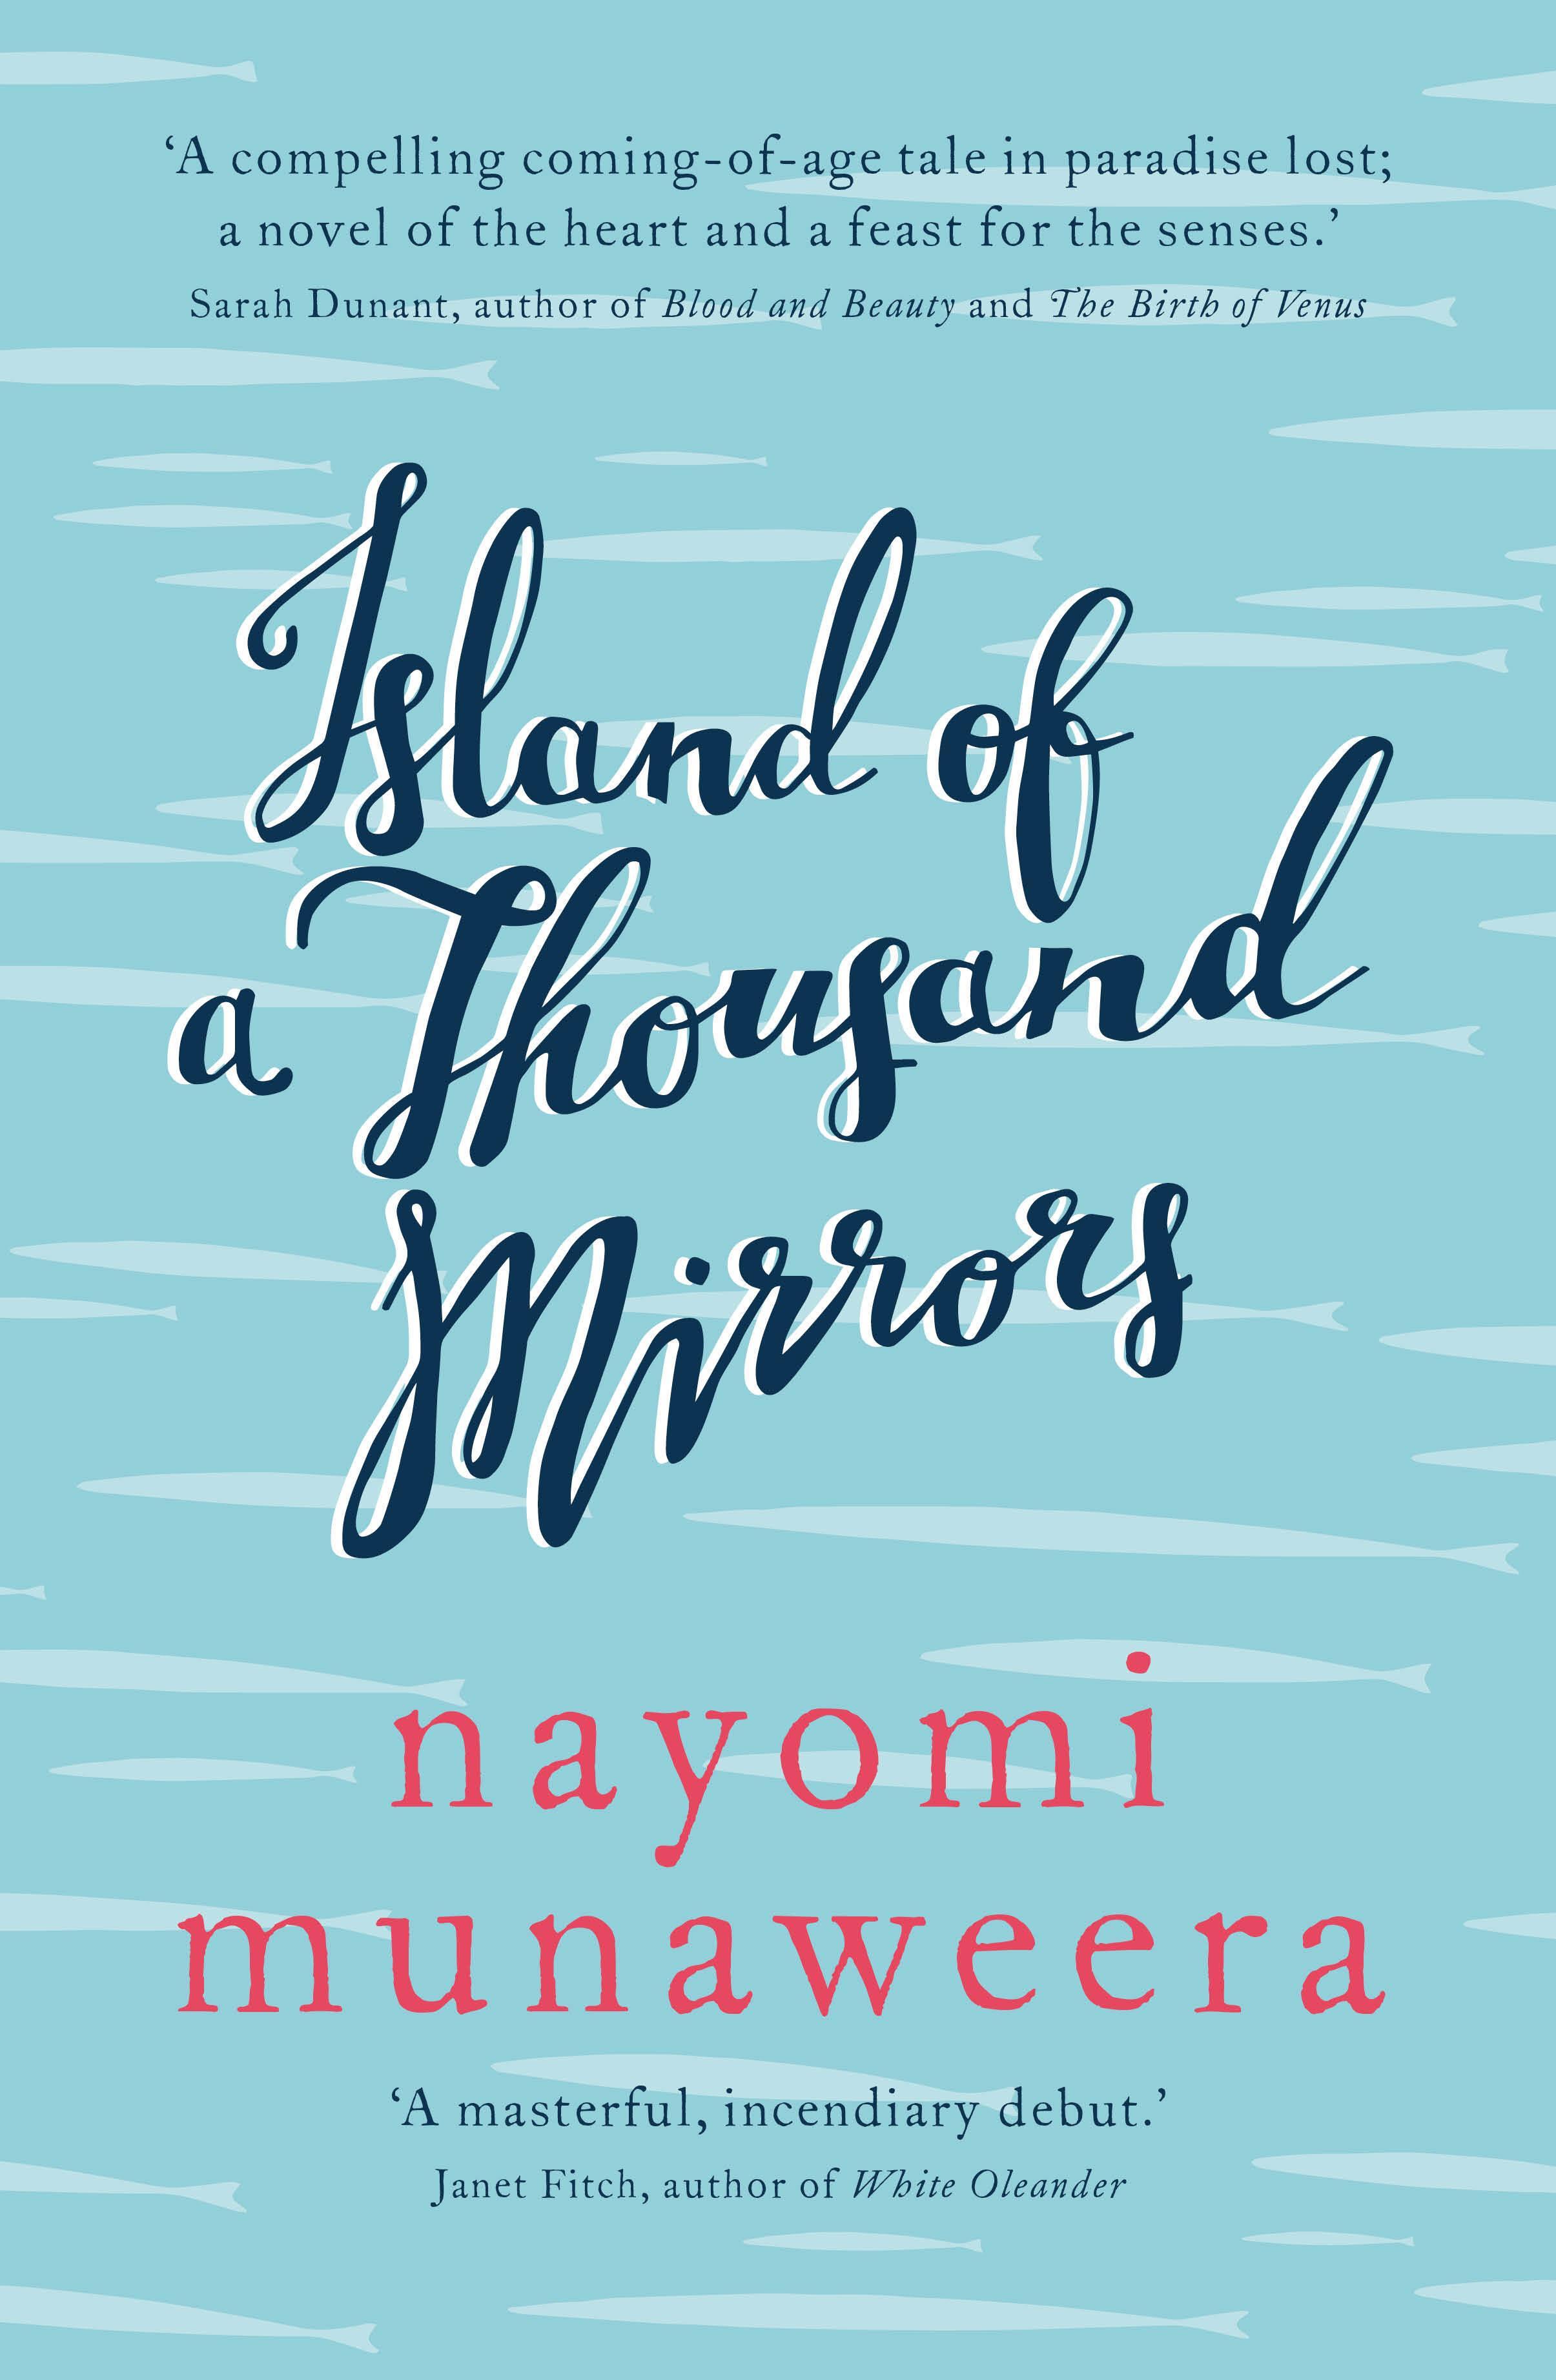 Island of aThousandMirrors